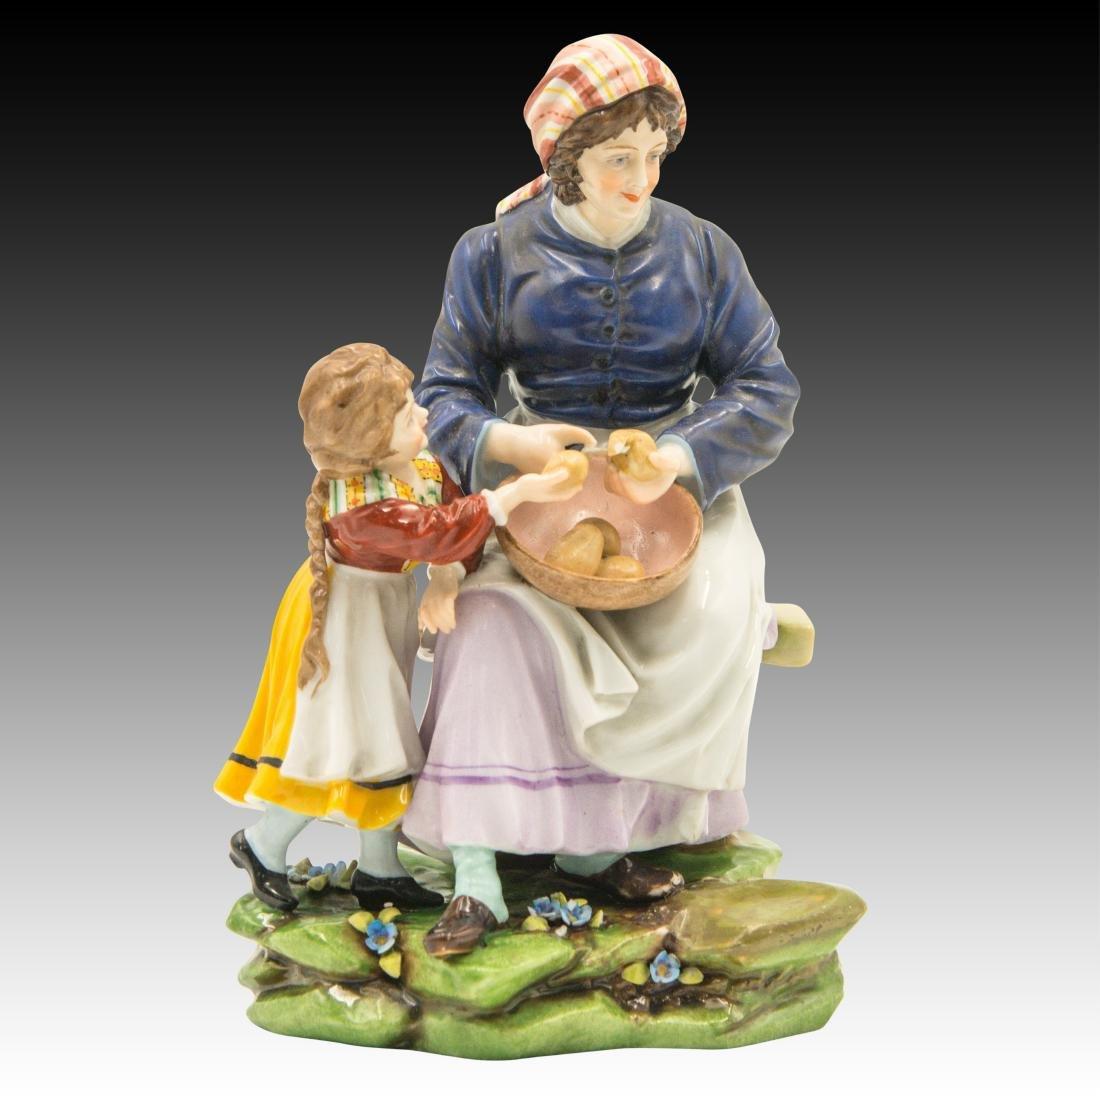 Sitzendorf Woman and Child Peeling Potatoes